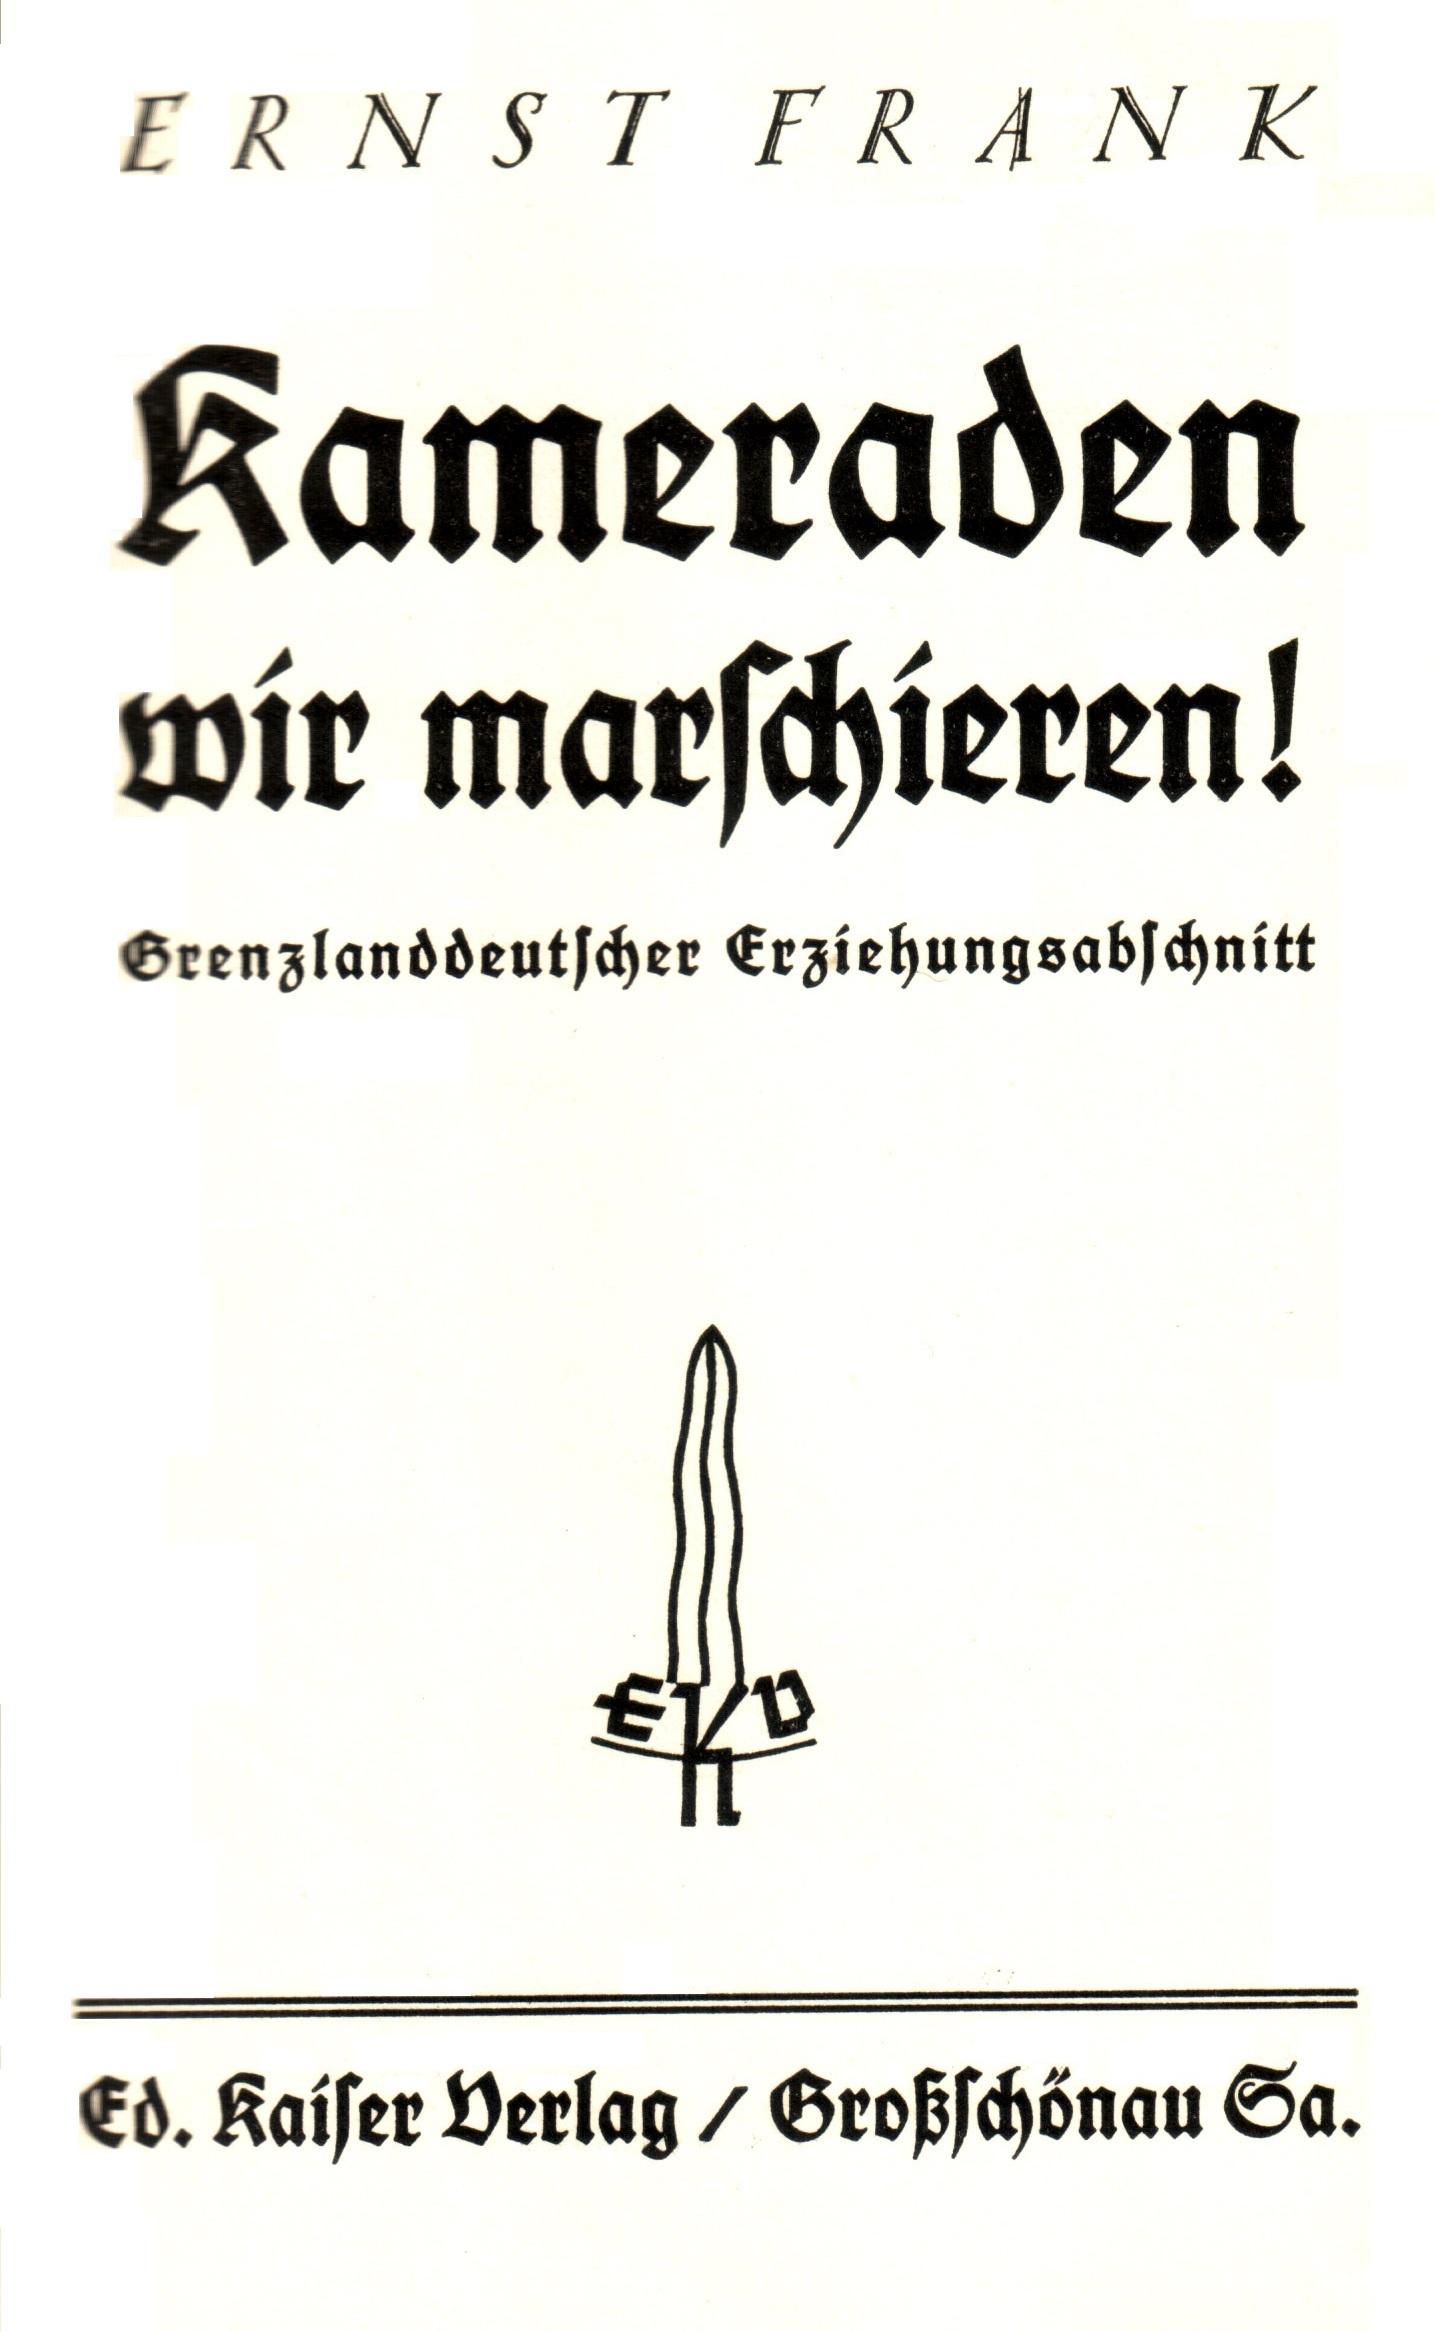 Eduard Kaiser Verlag Anzeige